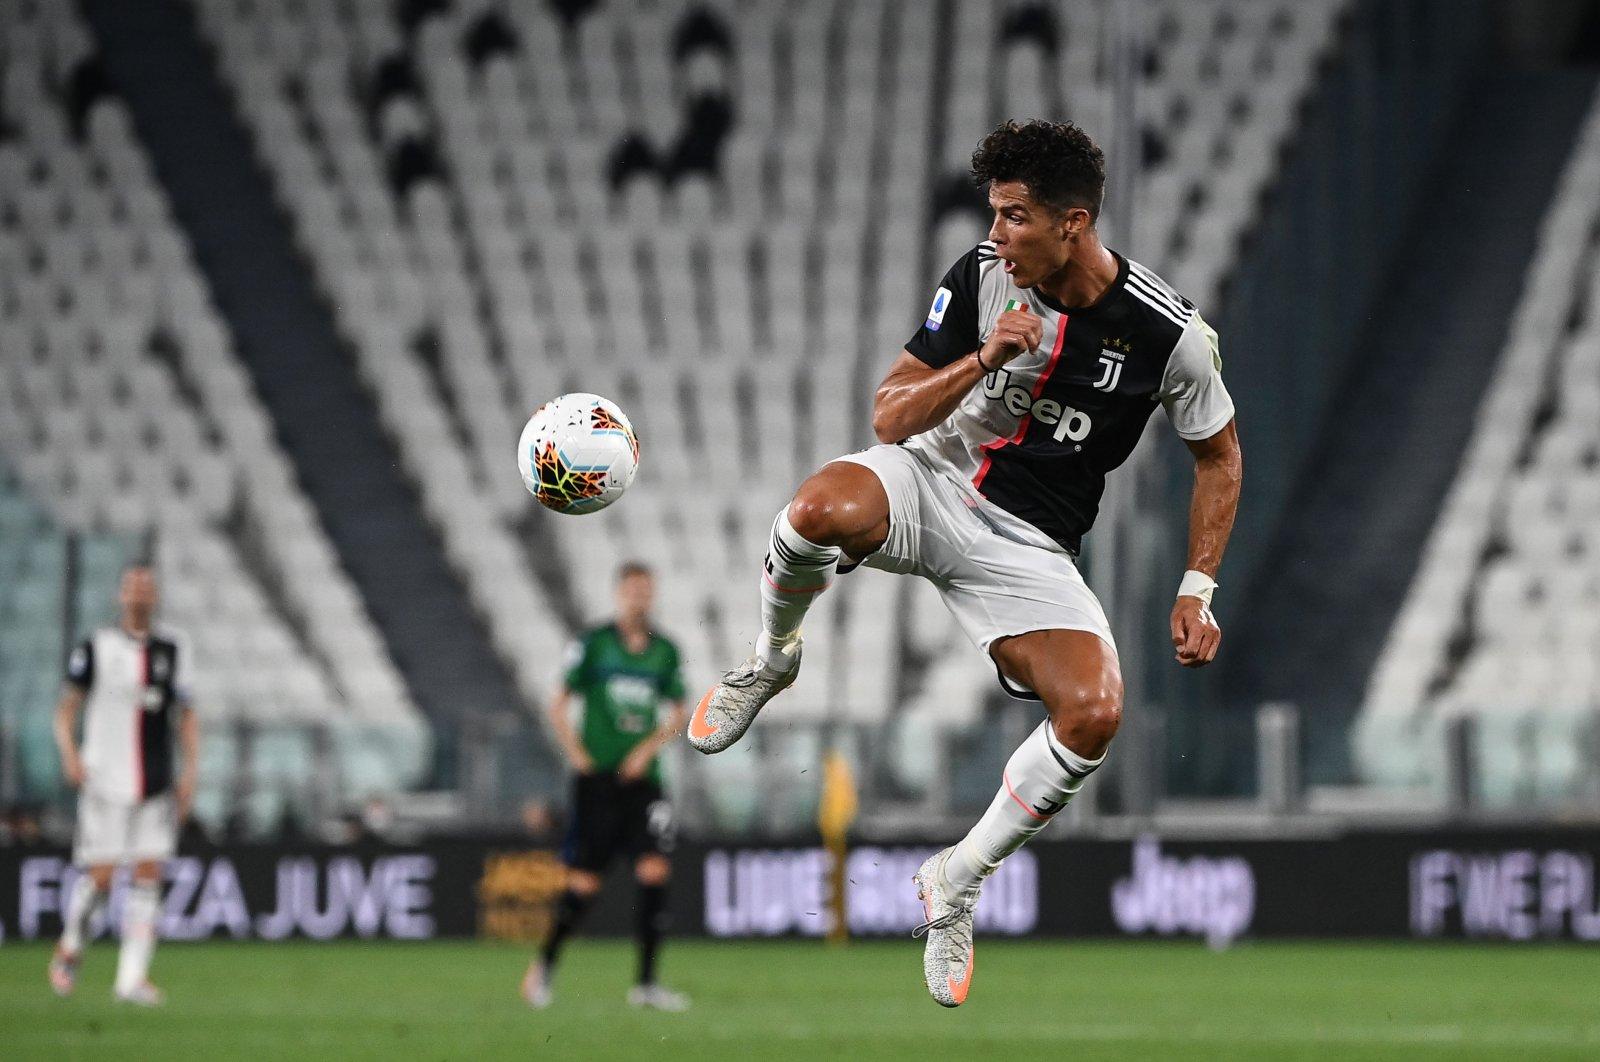 Juventus'  Cristiano Ronaldo controls the ball during a match between Juventus and Atalanta, in Turin, Italy, July 11, 2020. (AFP PHOTO)